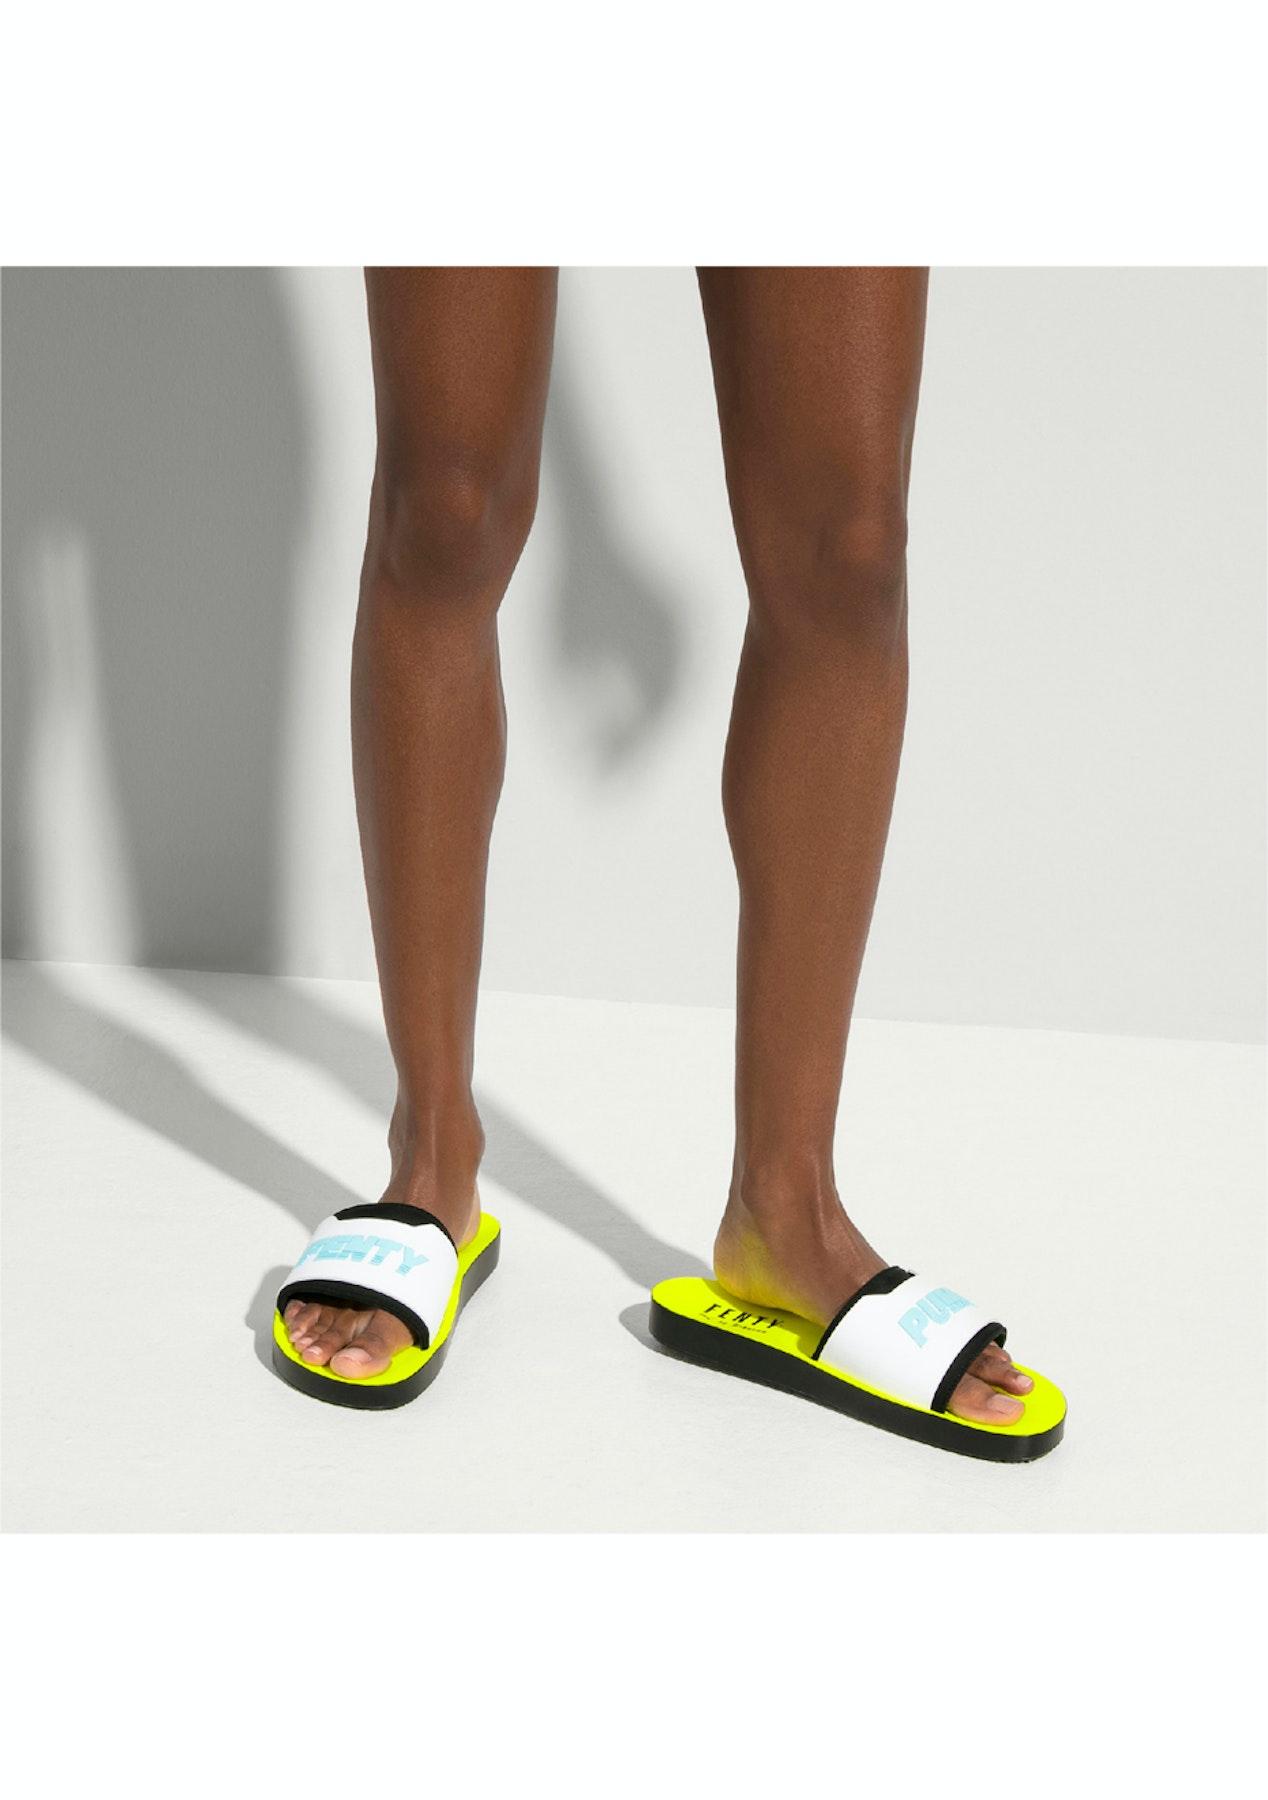 buy online ea45f 2d8a6 FENTY Womens Surf Slide - Black/White